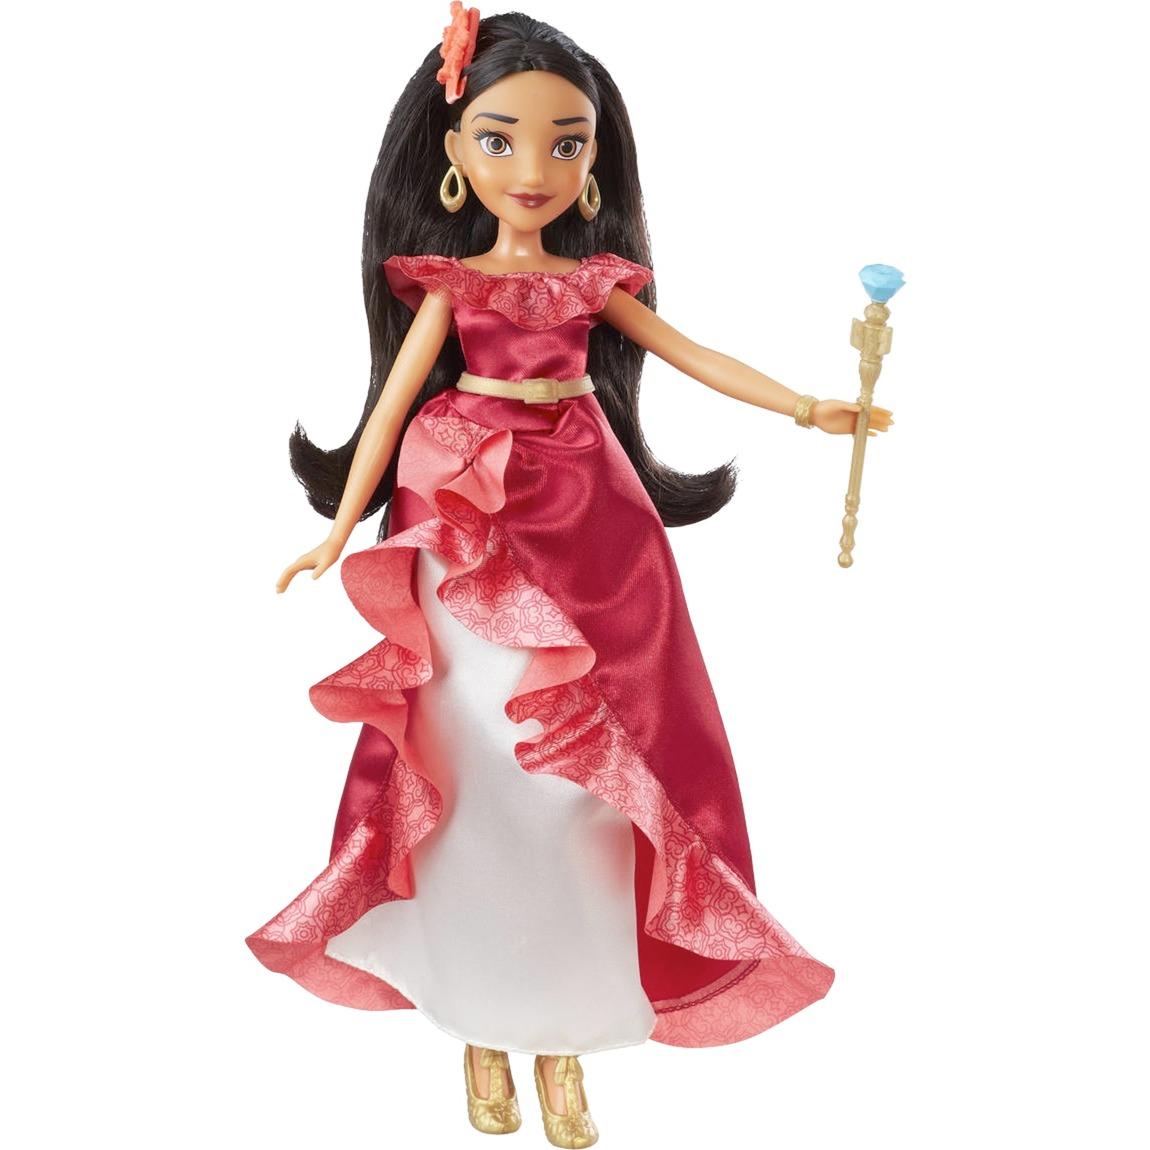 disney-elena-of-avalor-adventure-dress-doll-dukke